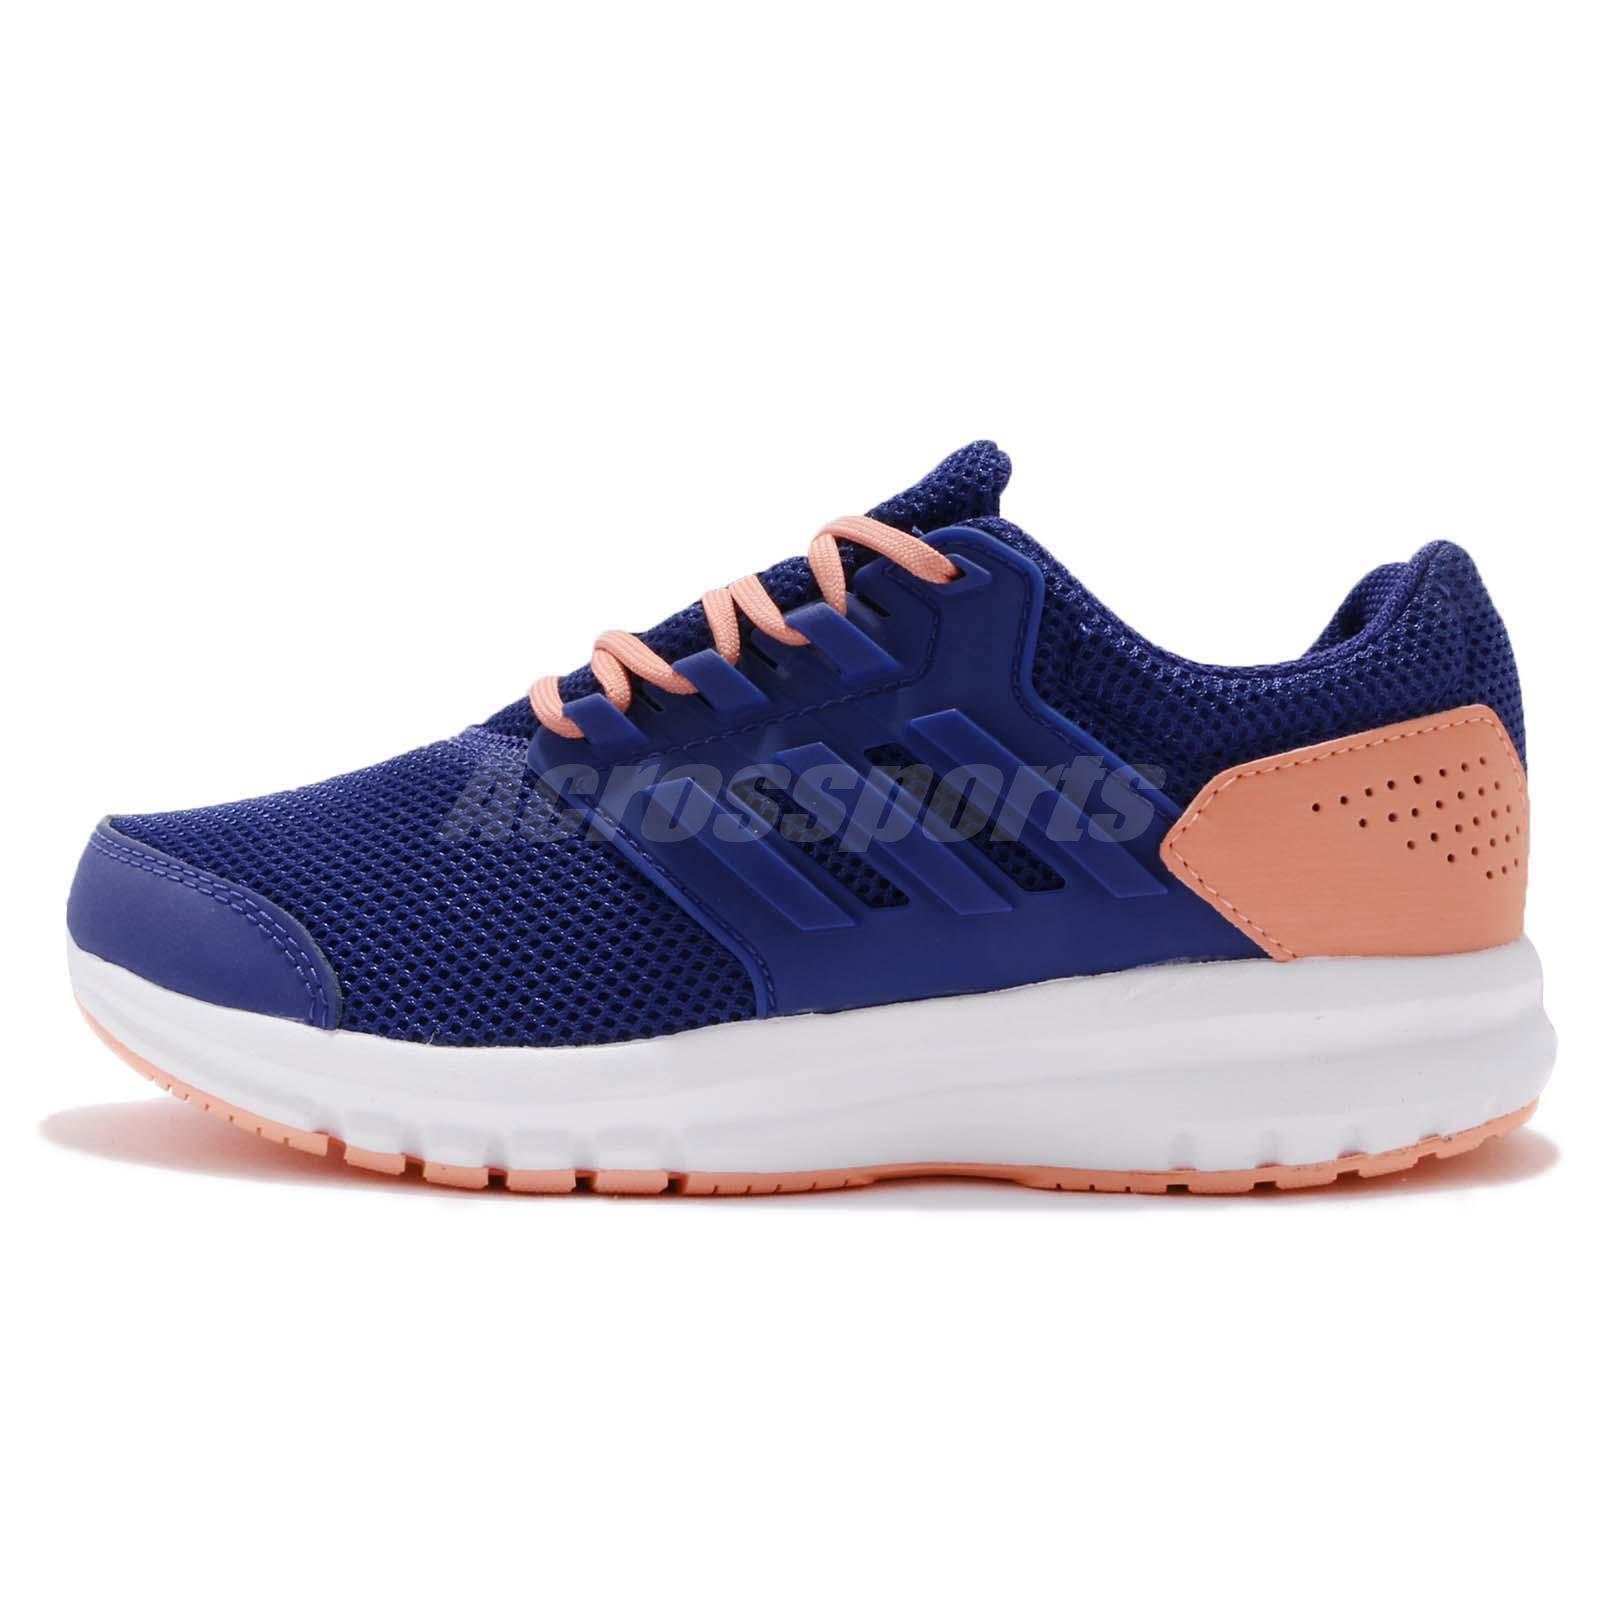 promo code 25b37 d1c2f adidas Galaxy 4 K Blue Real Purple White Kids Running Shoes Sneakers CQ1811